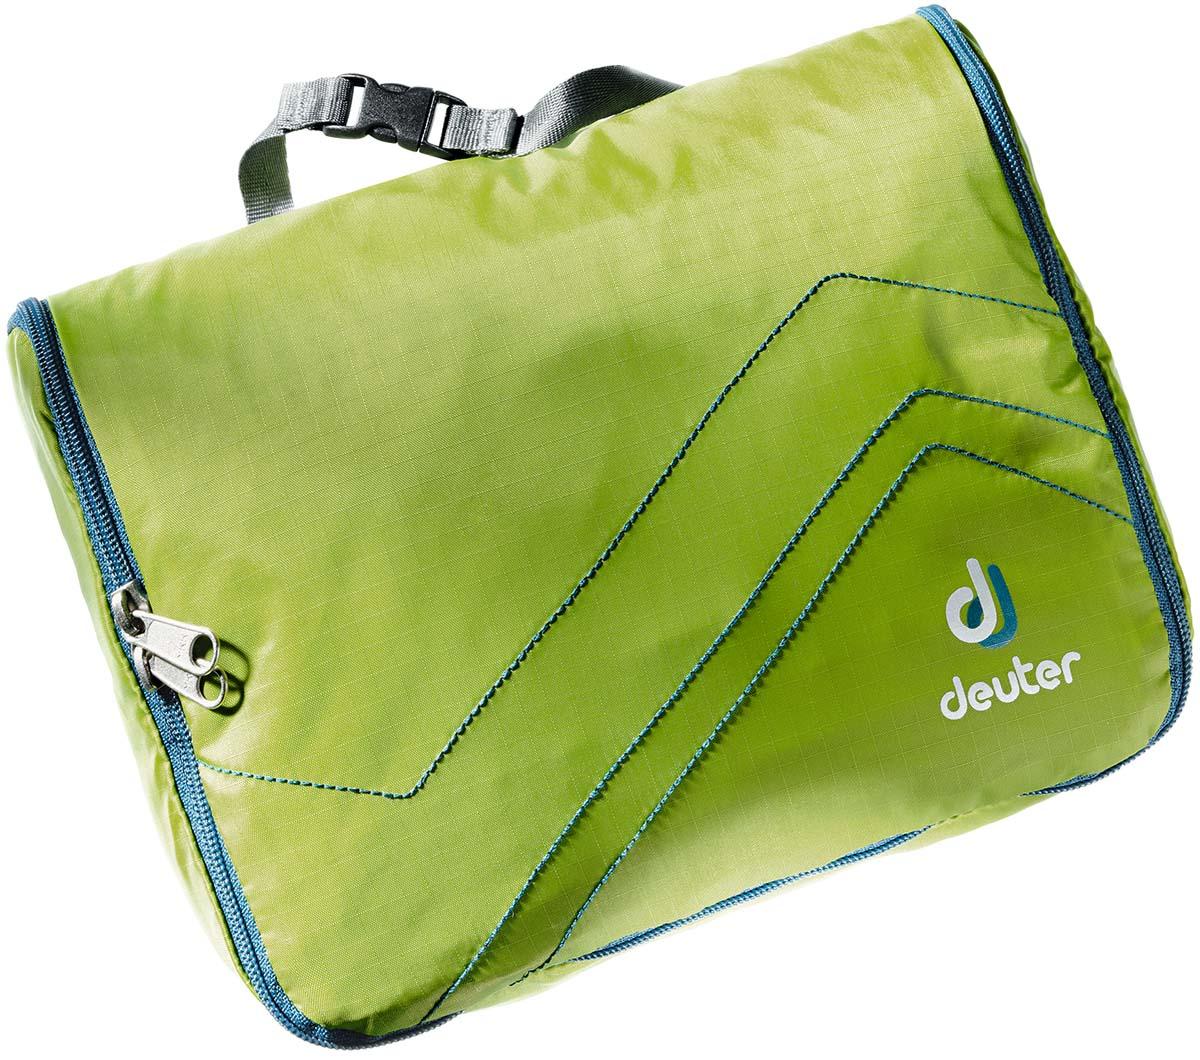 Косметичка Deuter Wash Center Lite I, цвет: темно-зеленый, серо-голубой, 15 см х 22 см х 6 см косметичка deuter accessoires wash room blackberry dresscode